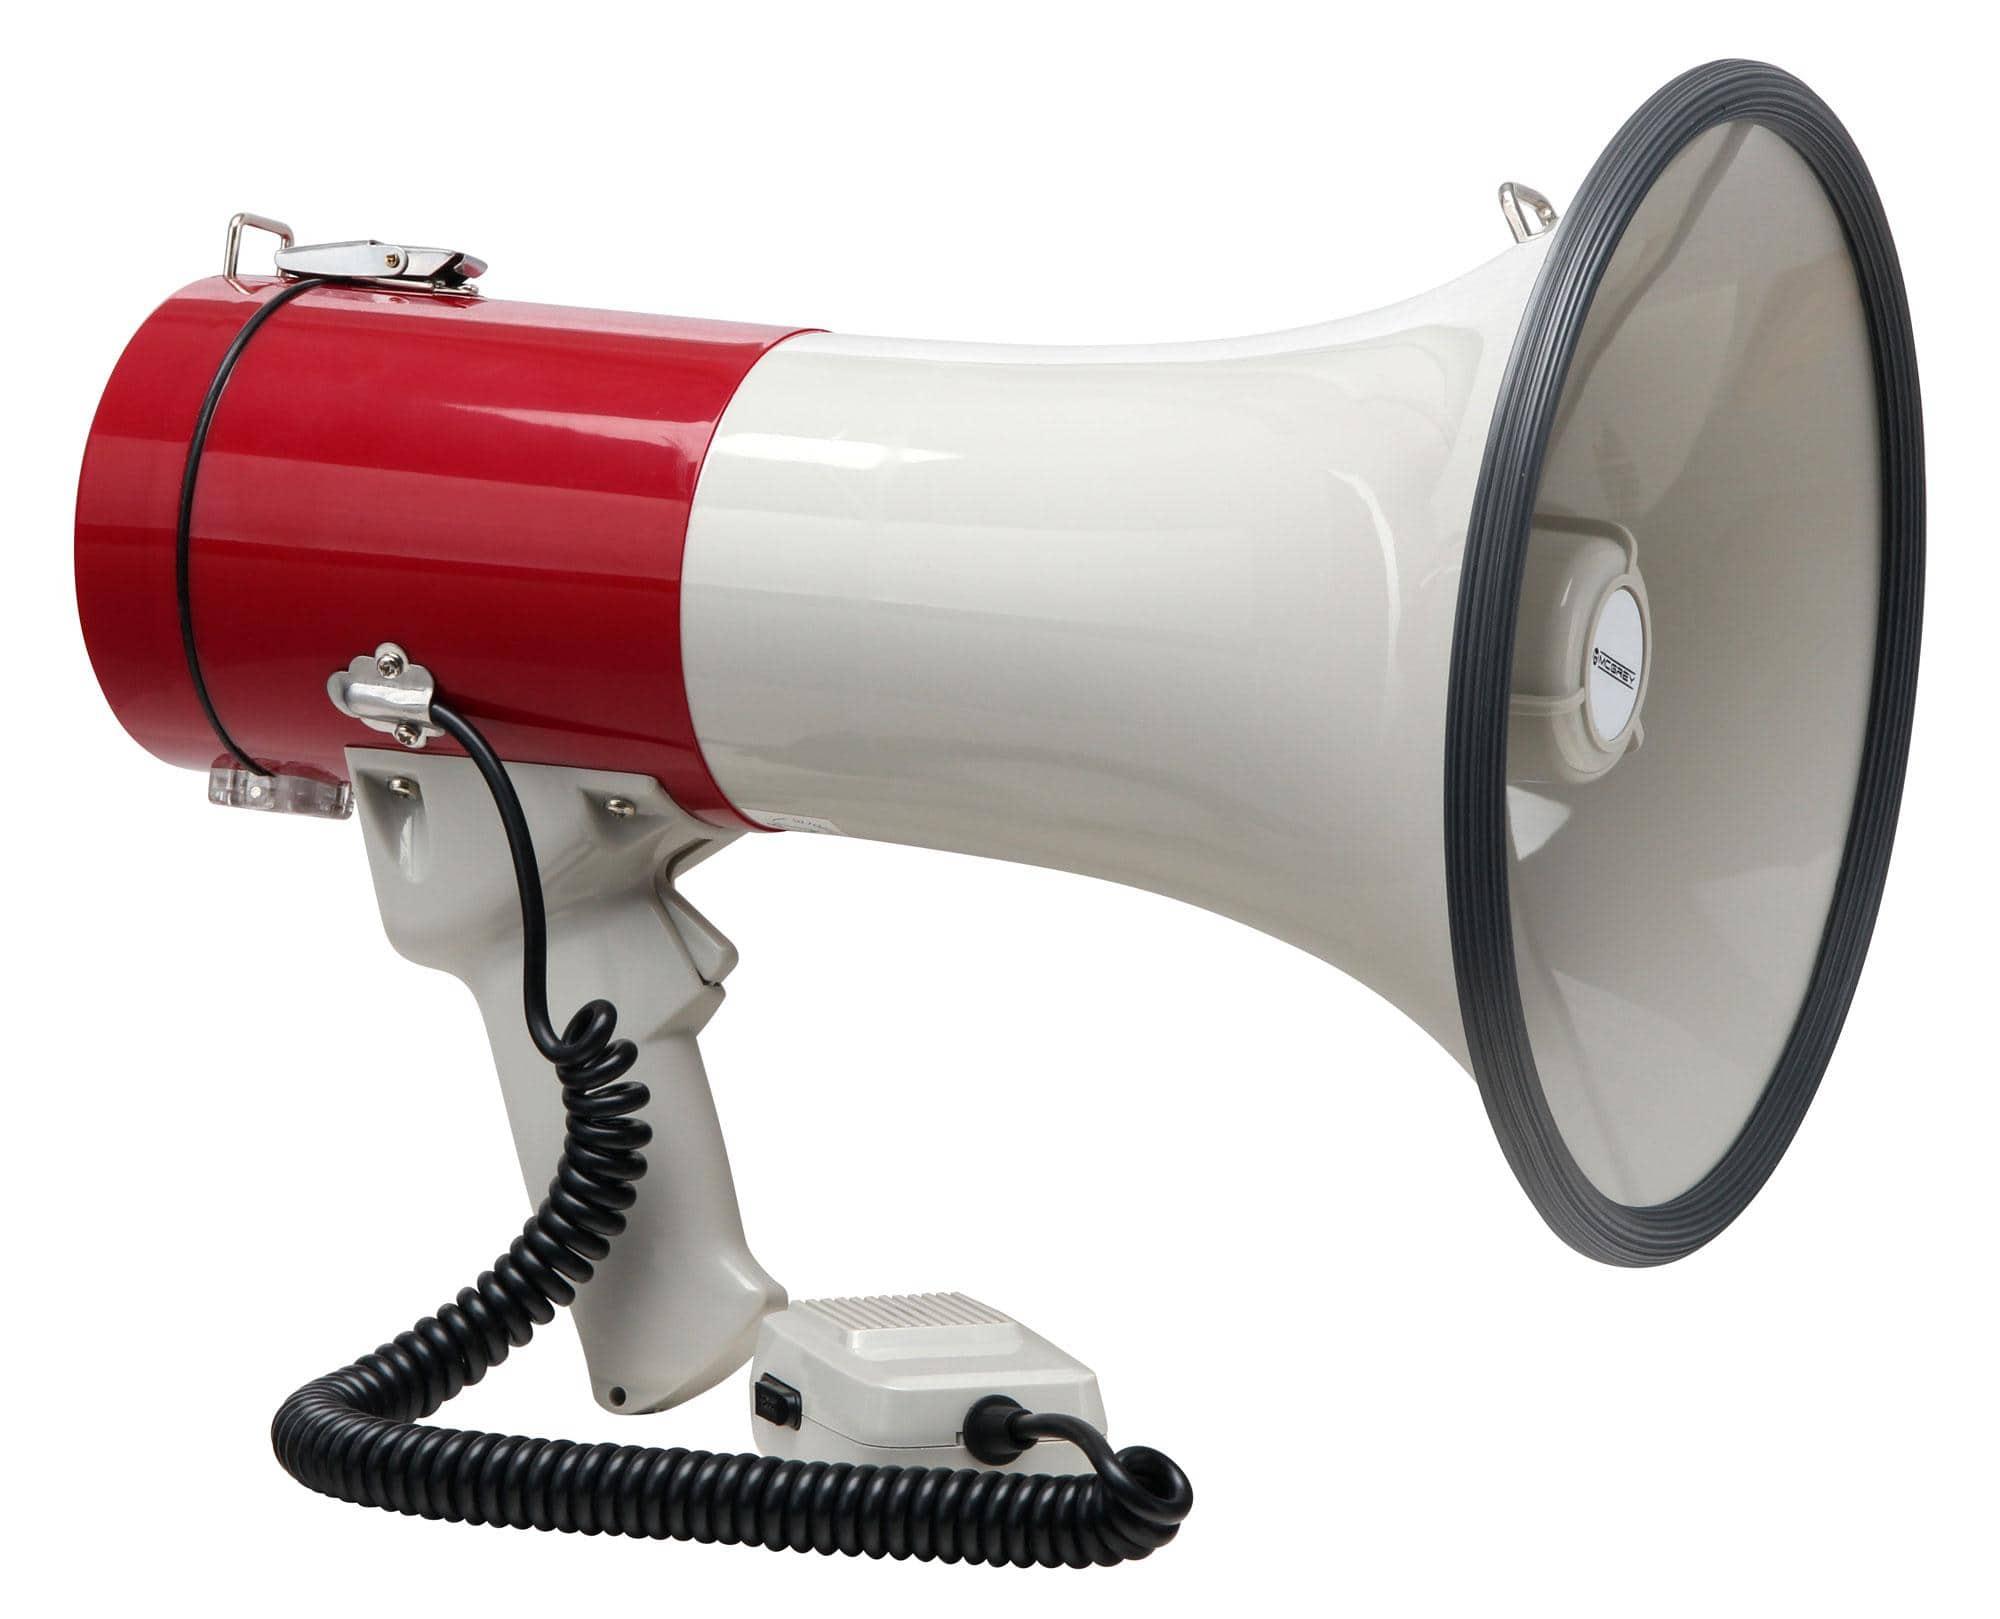 Mikrofone - McGrey MP 500HS Megaphon, max. 80 Watt, 1000m - Onlineshop Musikhaus Kirstein